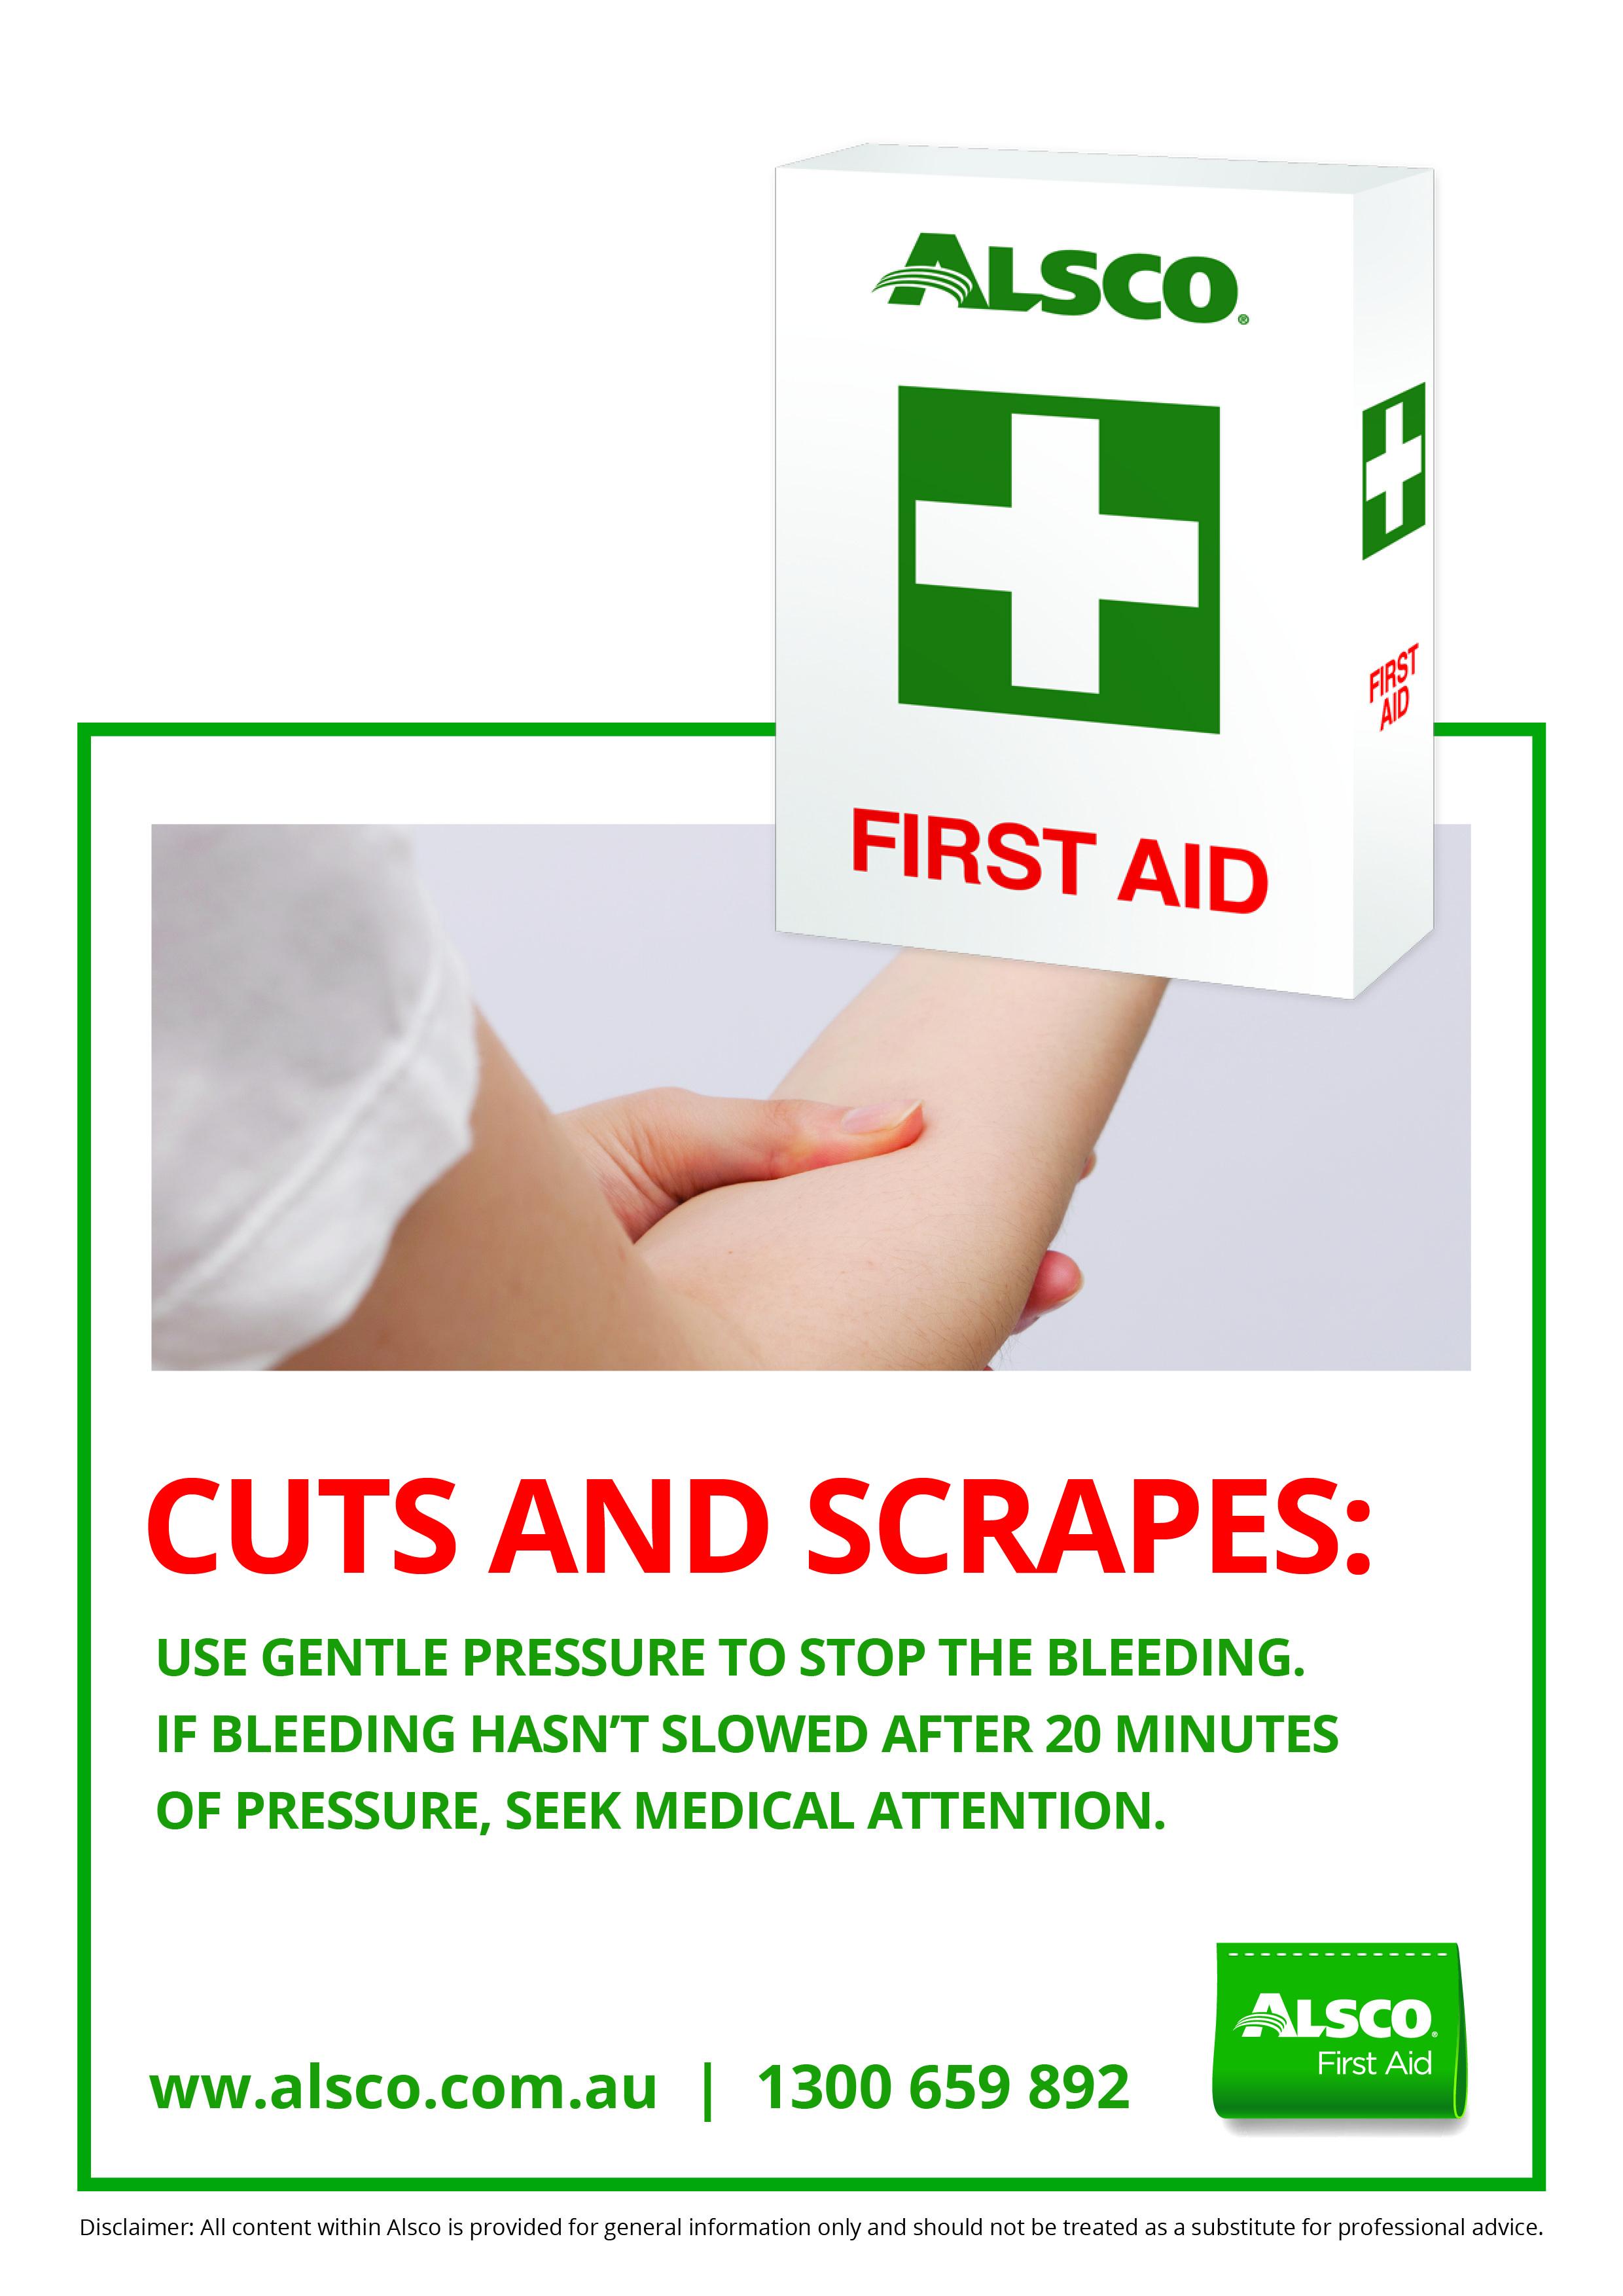 Cuts and scrapes